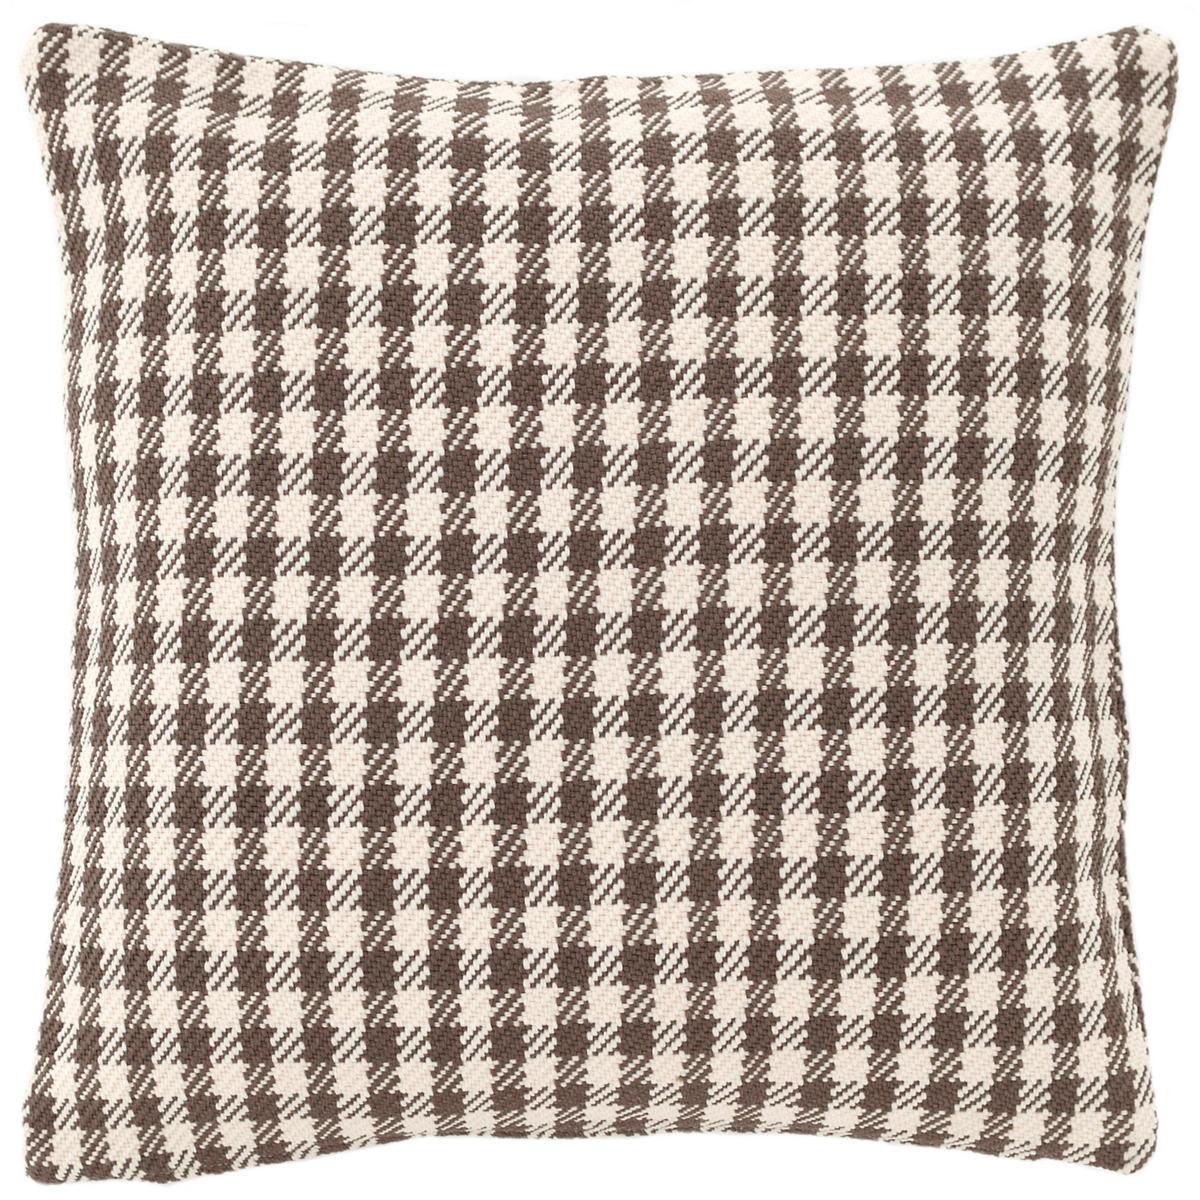 Houndstooth Charcoal/Ivory Indoor/Outdoor Pillow